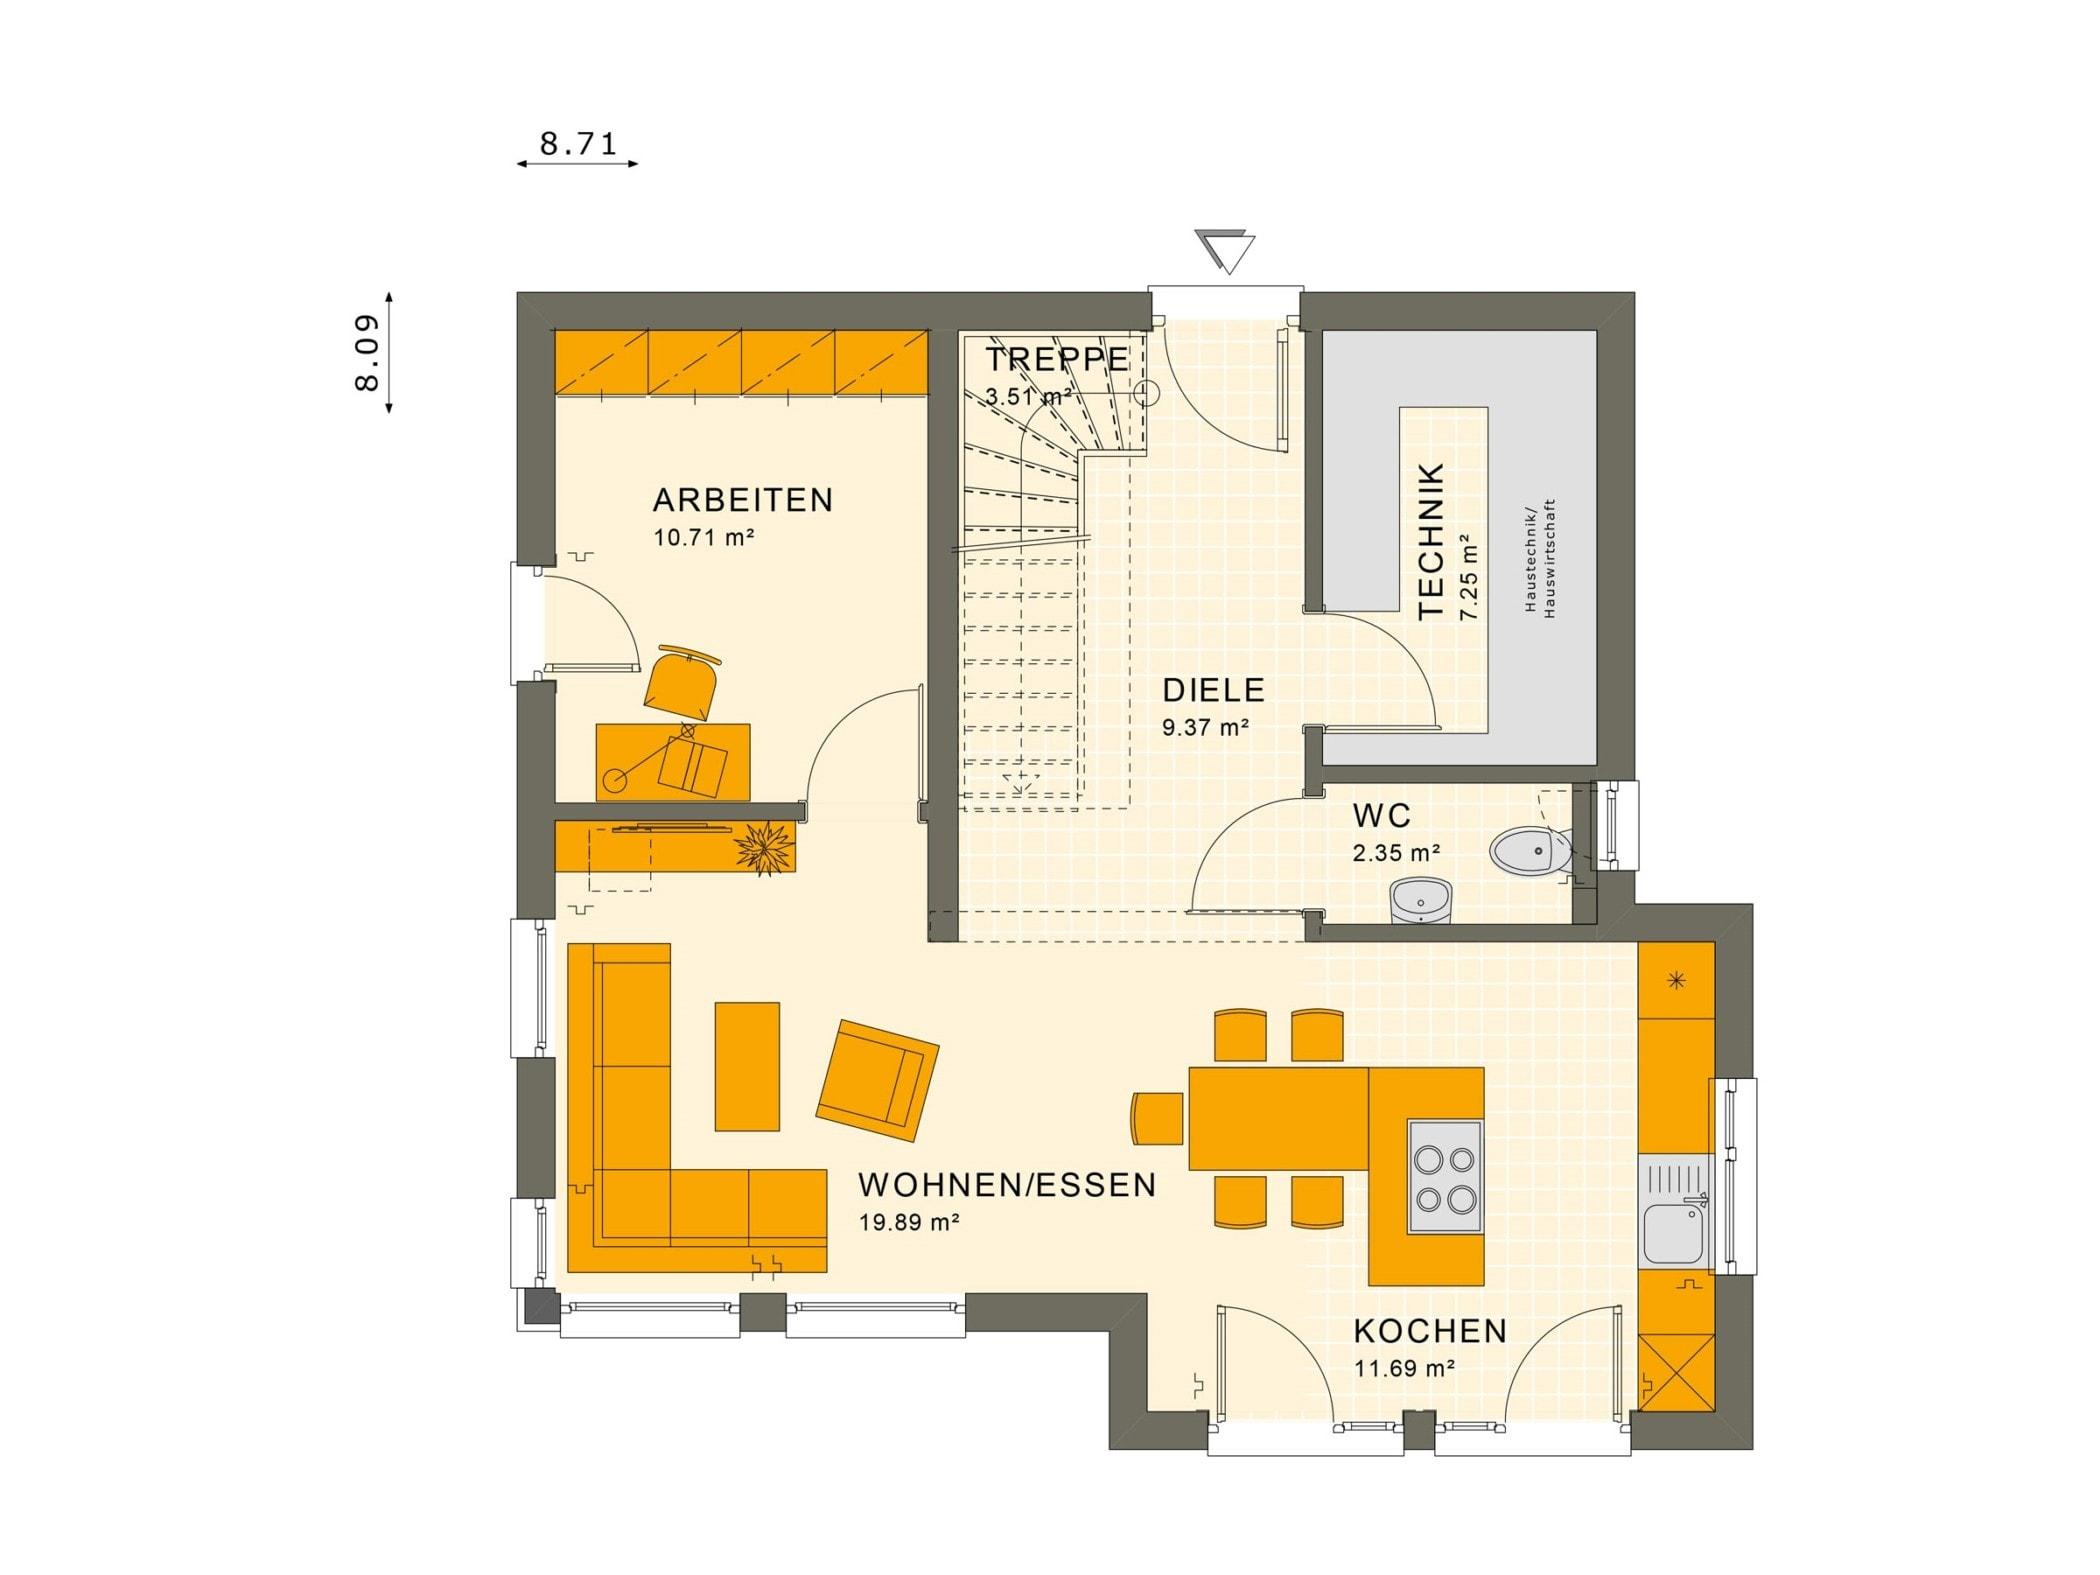 Einfamilienhaus Grundriss Erdgeschoss quadratisch mit Erker - Haus bauen Ideen Fertighaus Stadtvilla SUNSHINE 113 V8 von Living Haus - HausbauDirekt.de